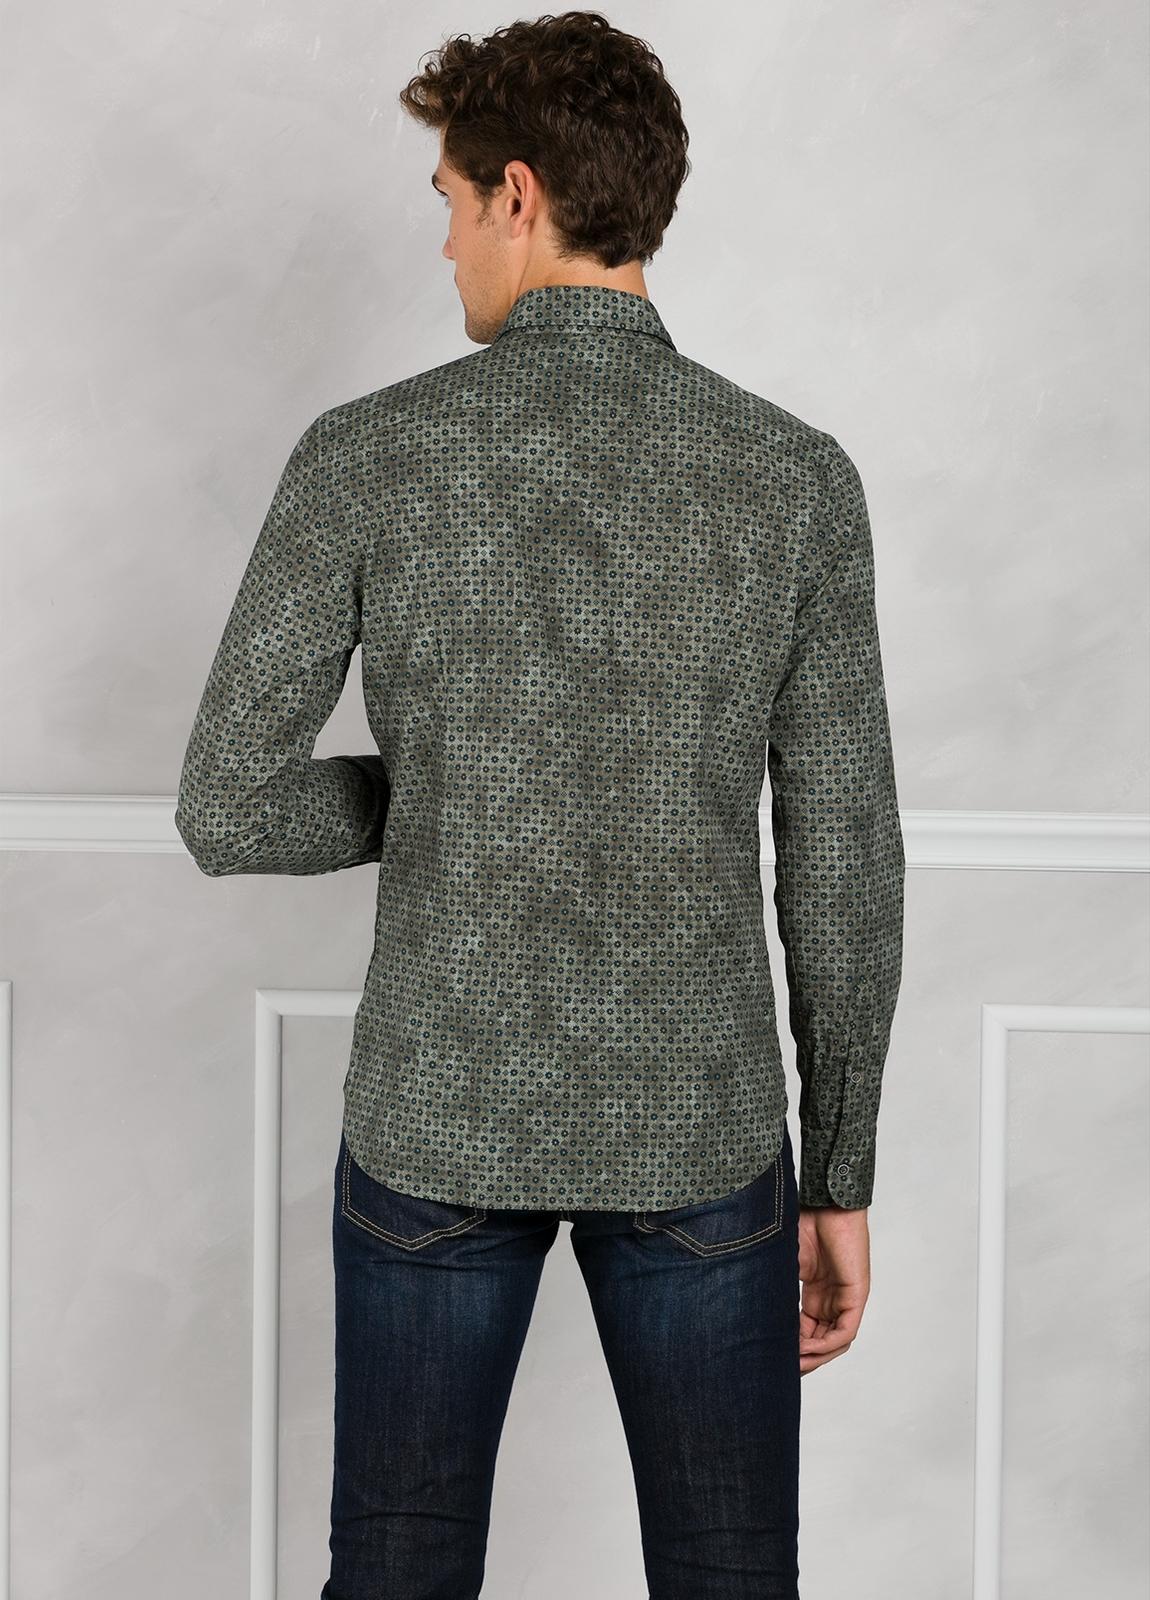 Camisa Leisure Wear SLIM FIT modelo PORTO estampado fantasía color kaki. 100% Algodón. - Ítem3